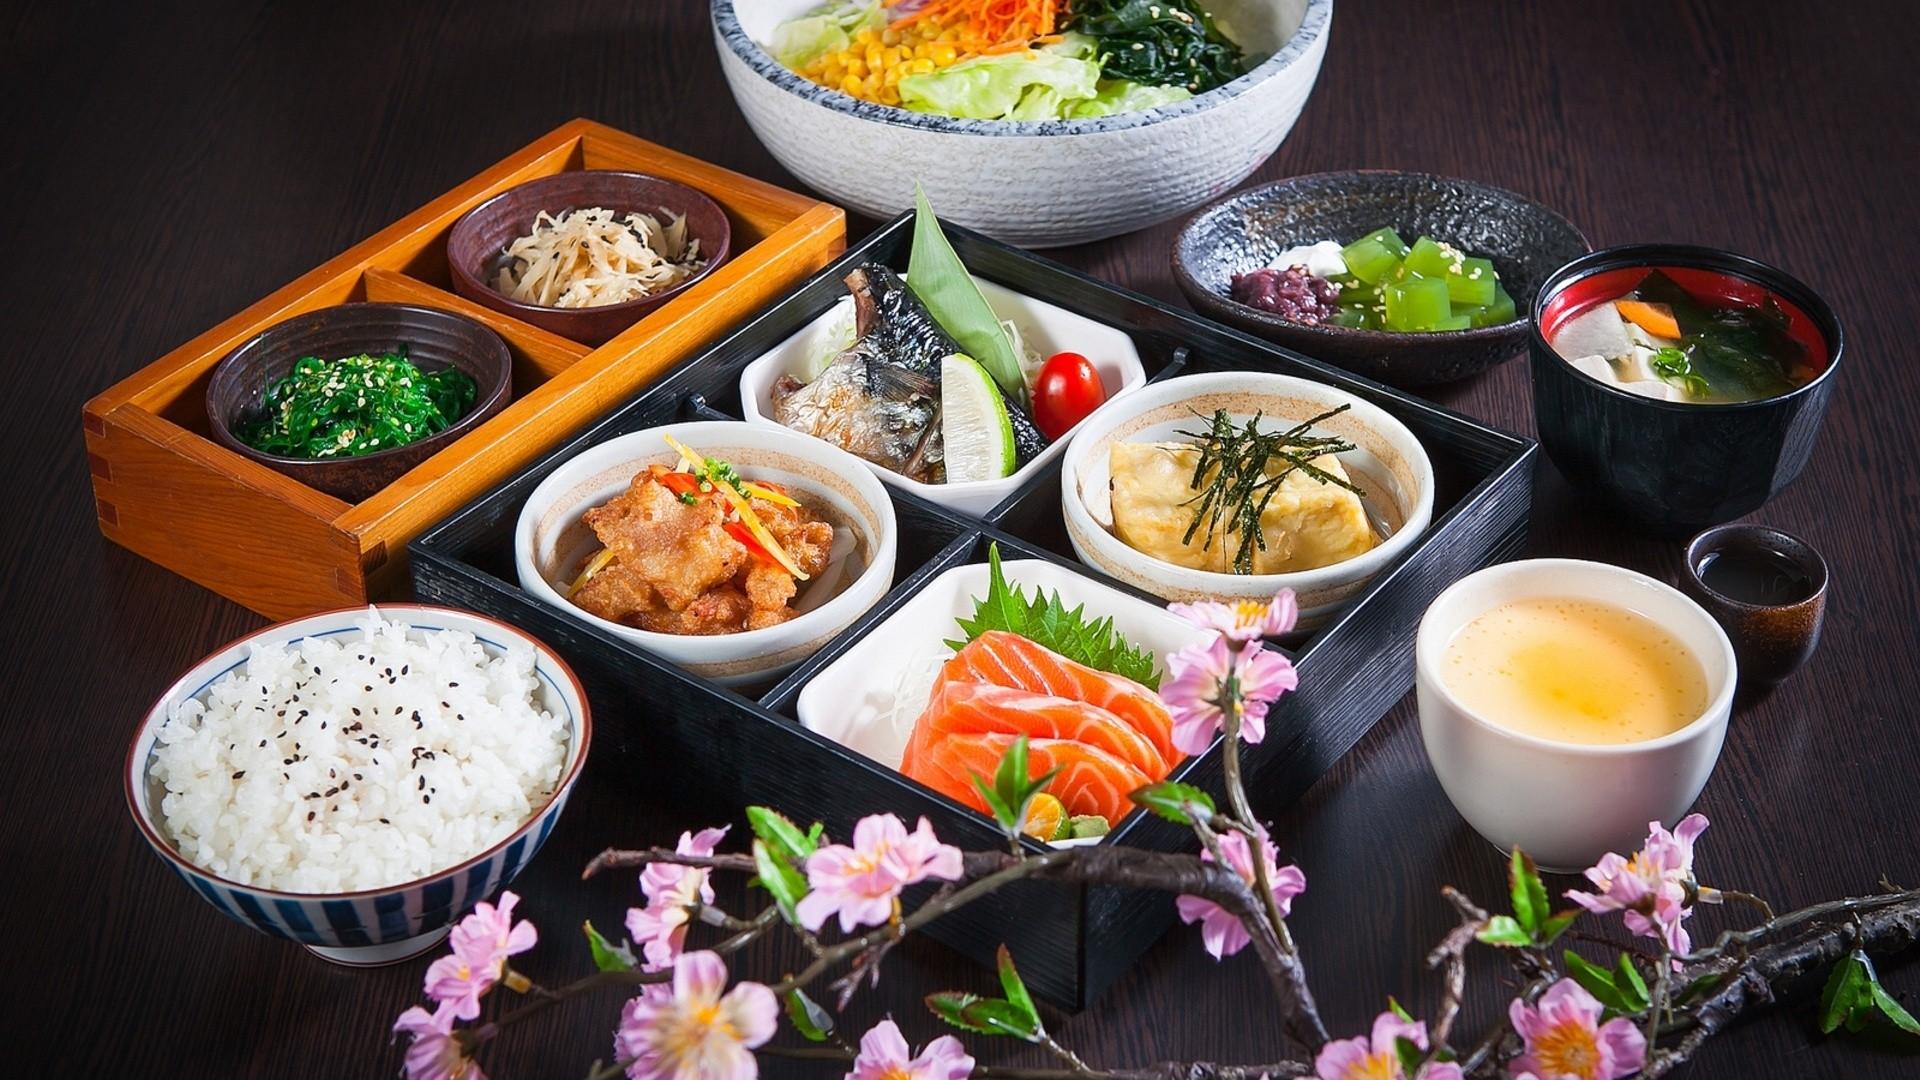 food lunch rice meal cuisine buffet dish asian food chinese food 291633 - Рассказ туриста-обывателя о своем путешествии в Пекин. Китай